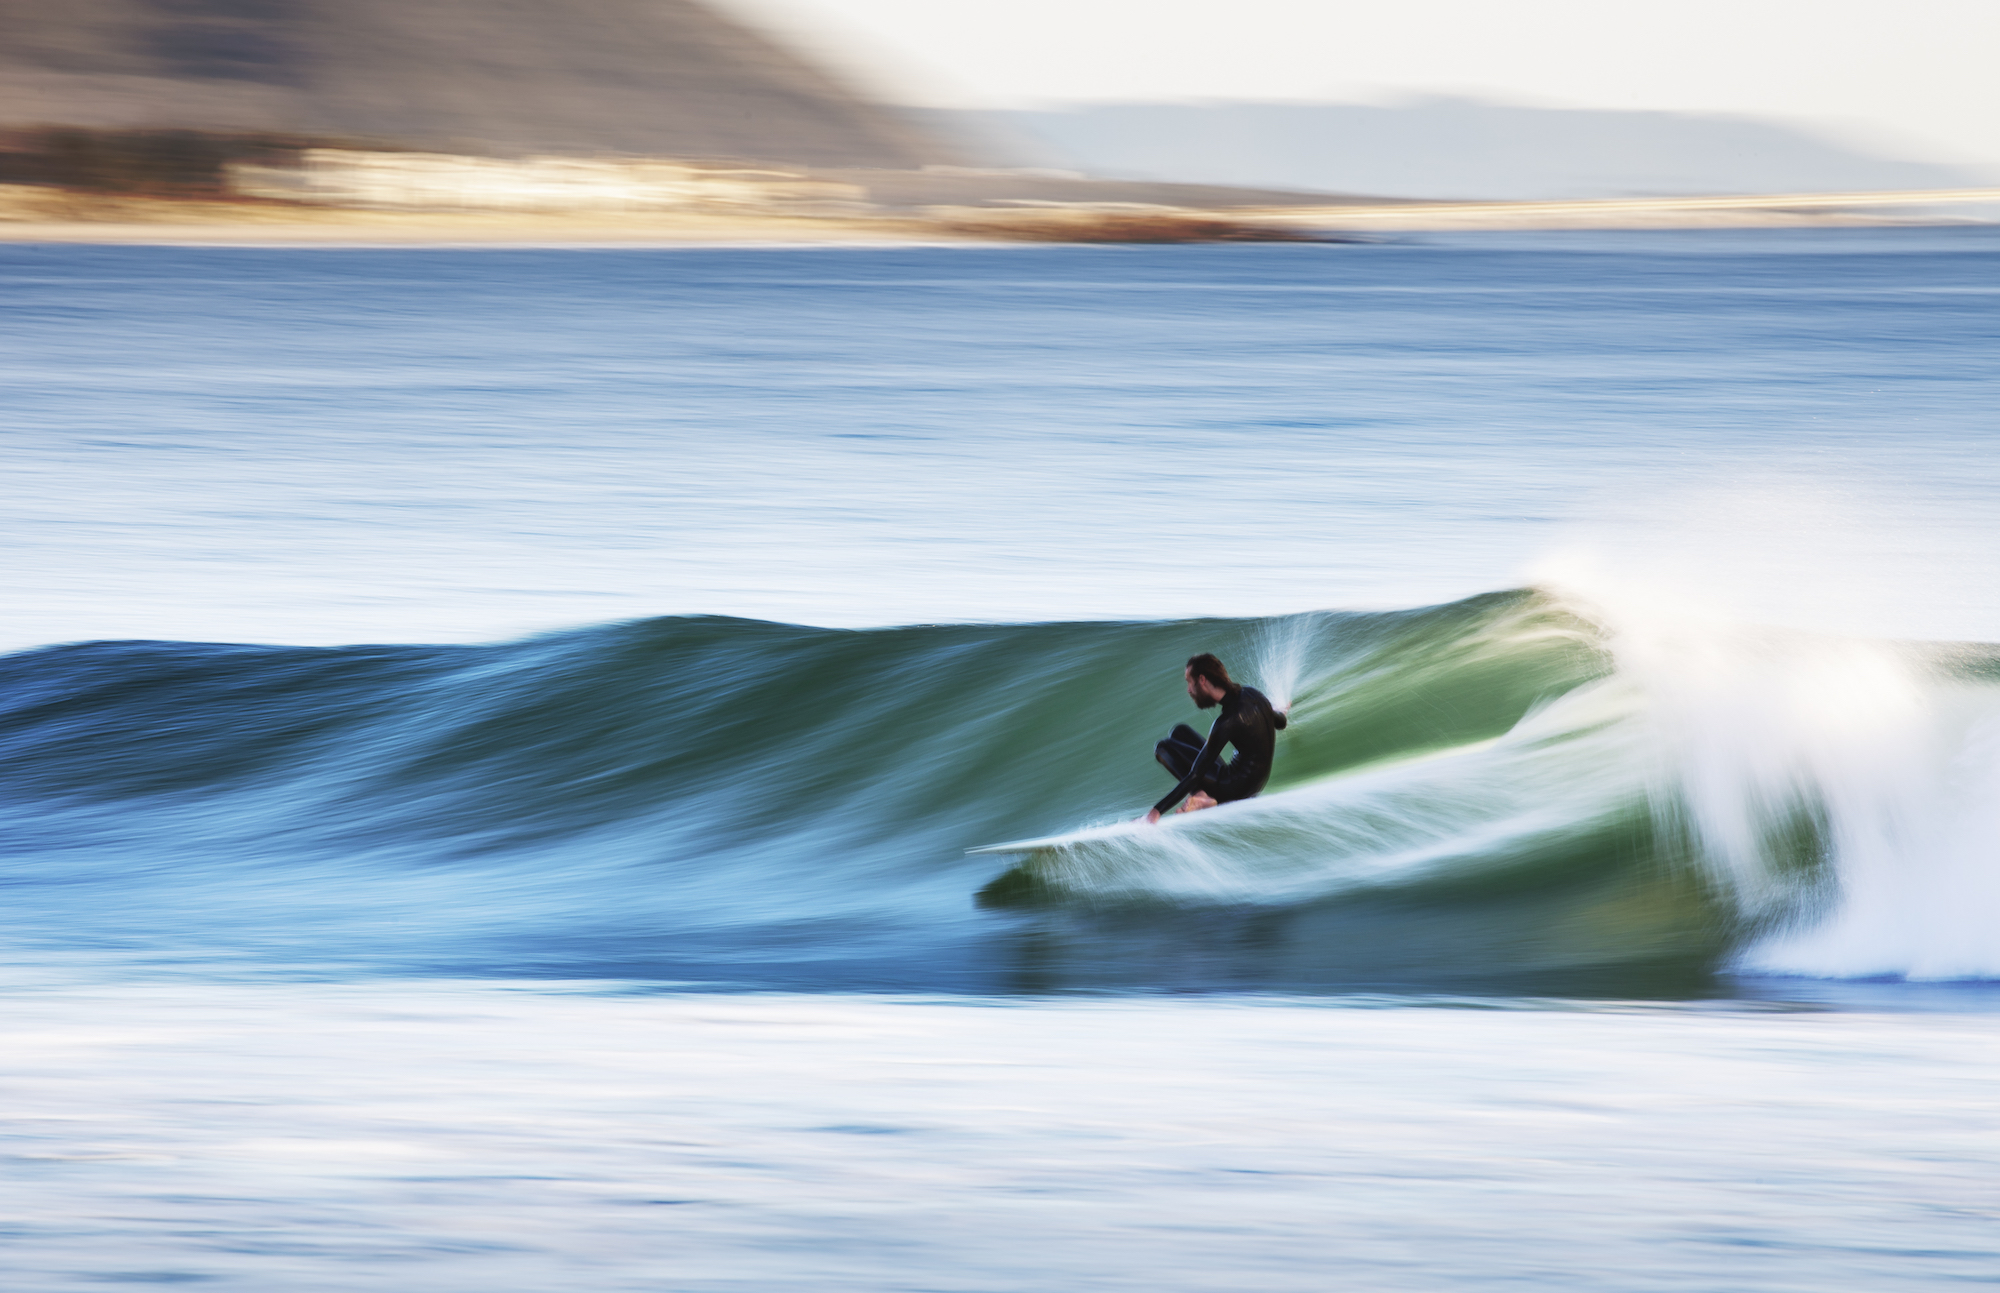 Paul Greene Wins 2020 Follow the Light Grant – Surfline.com Surf News